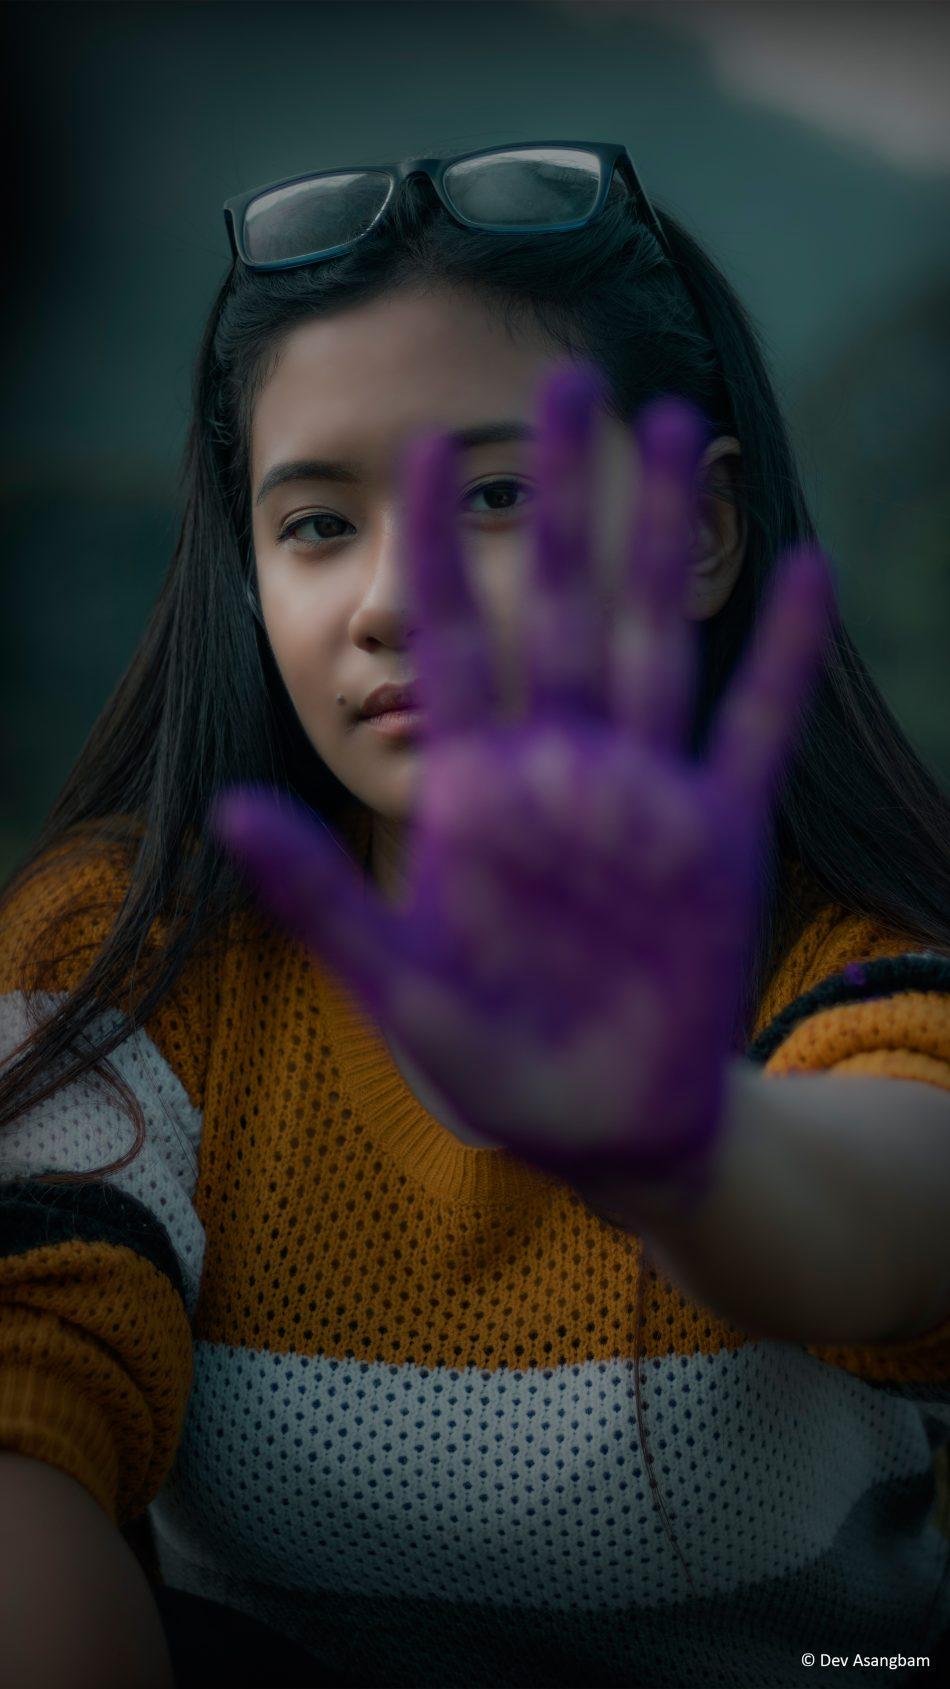 Girl Photography Hand Purple Color 4K Ultra HD Mobile Wallpaper